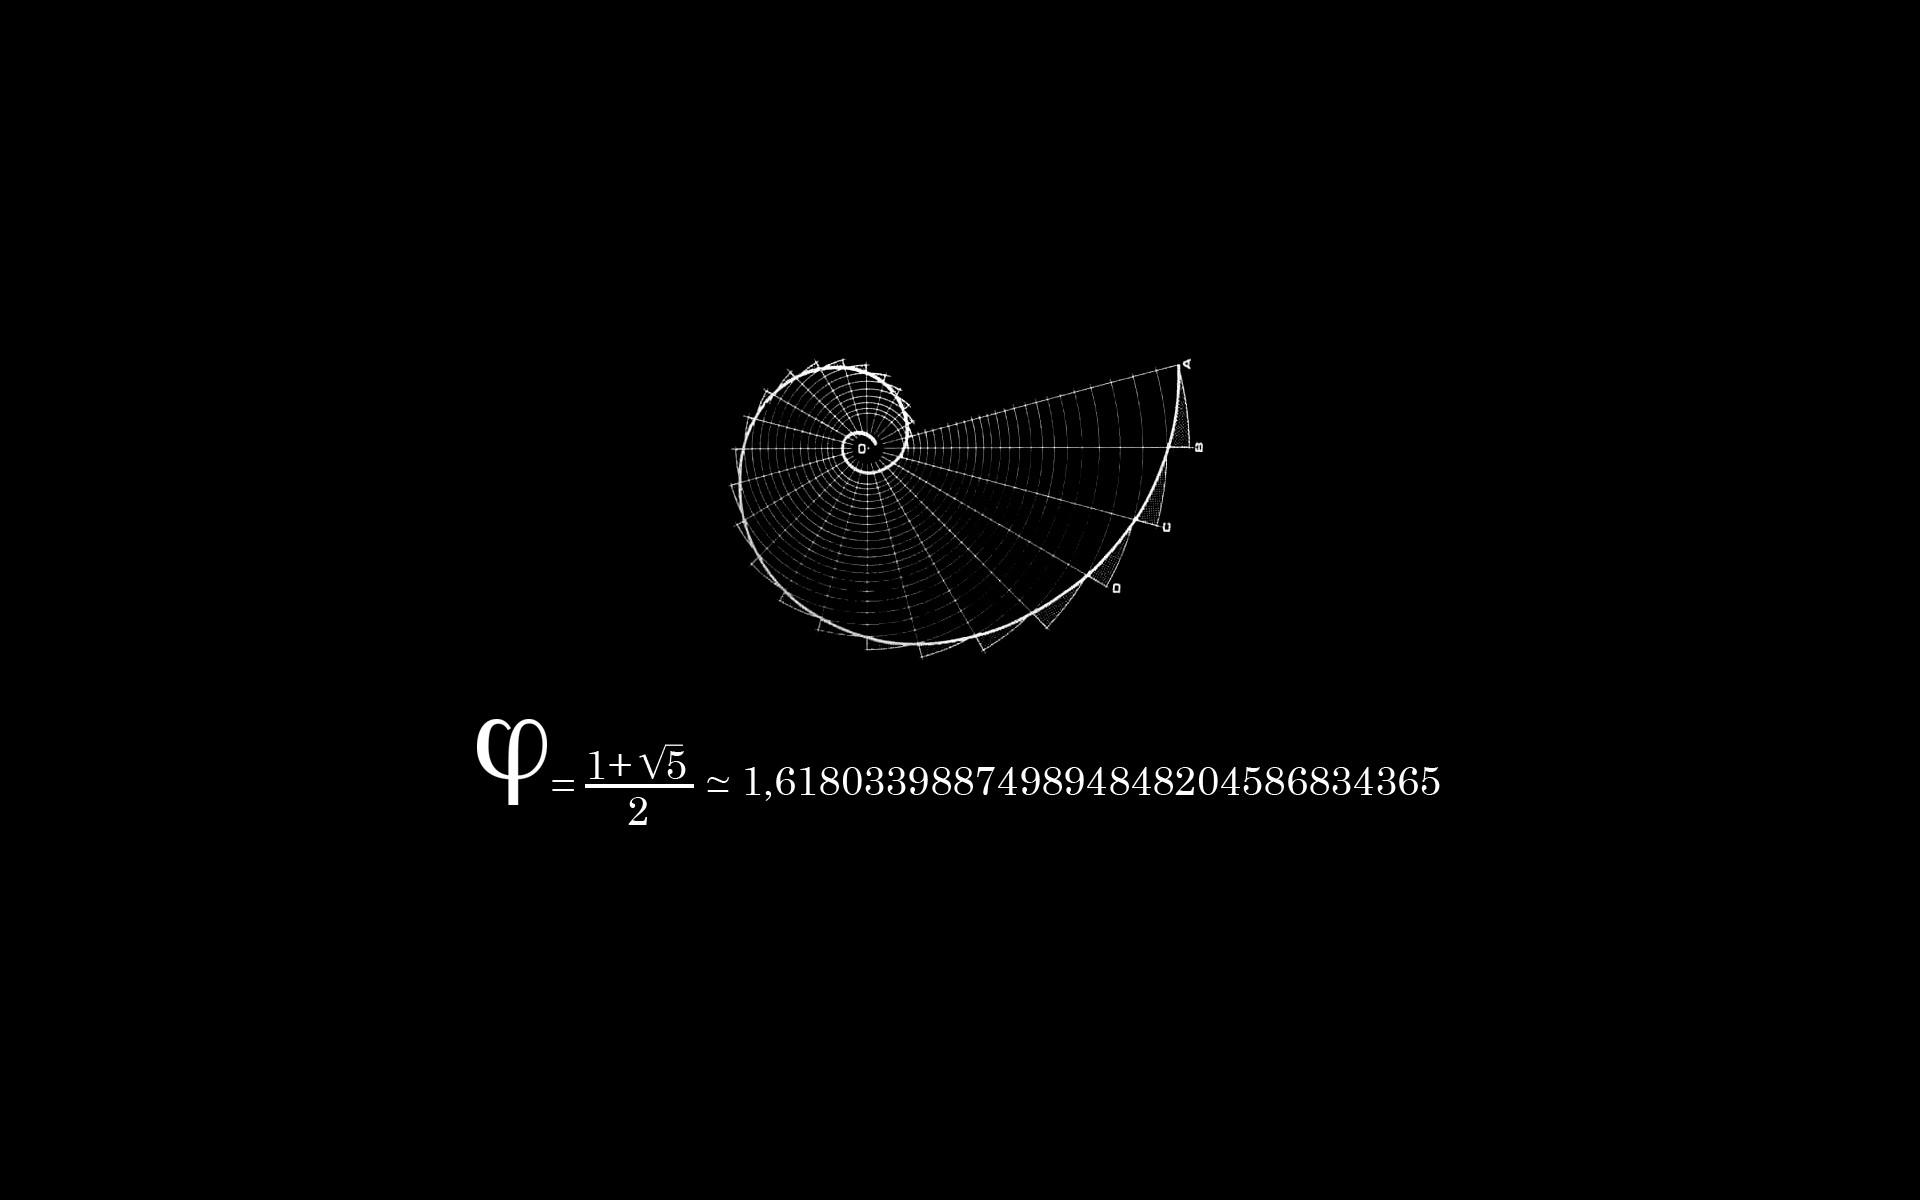 Quantum Mechanics Wallpaper